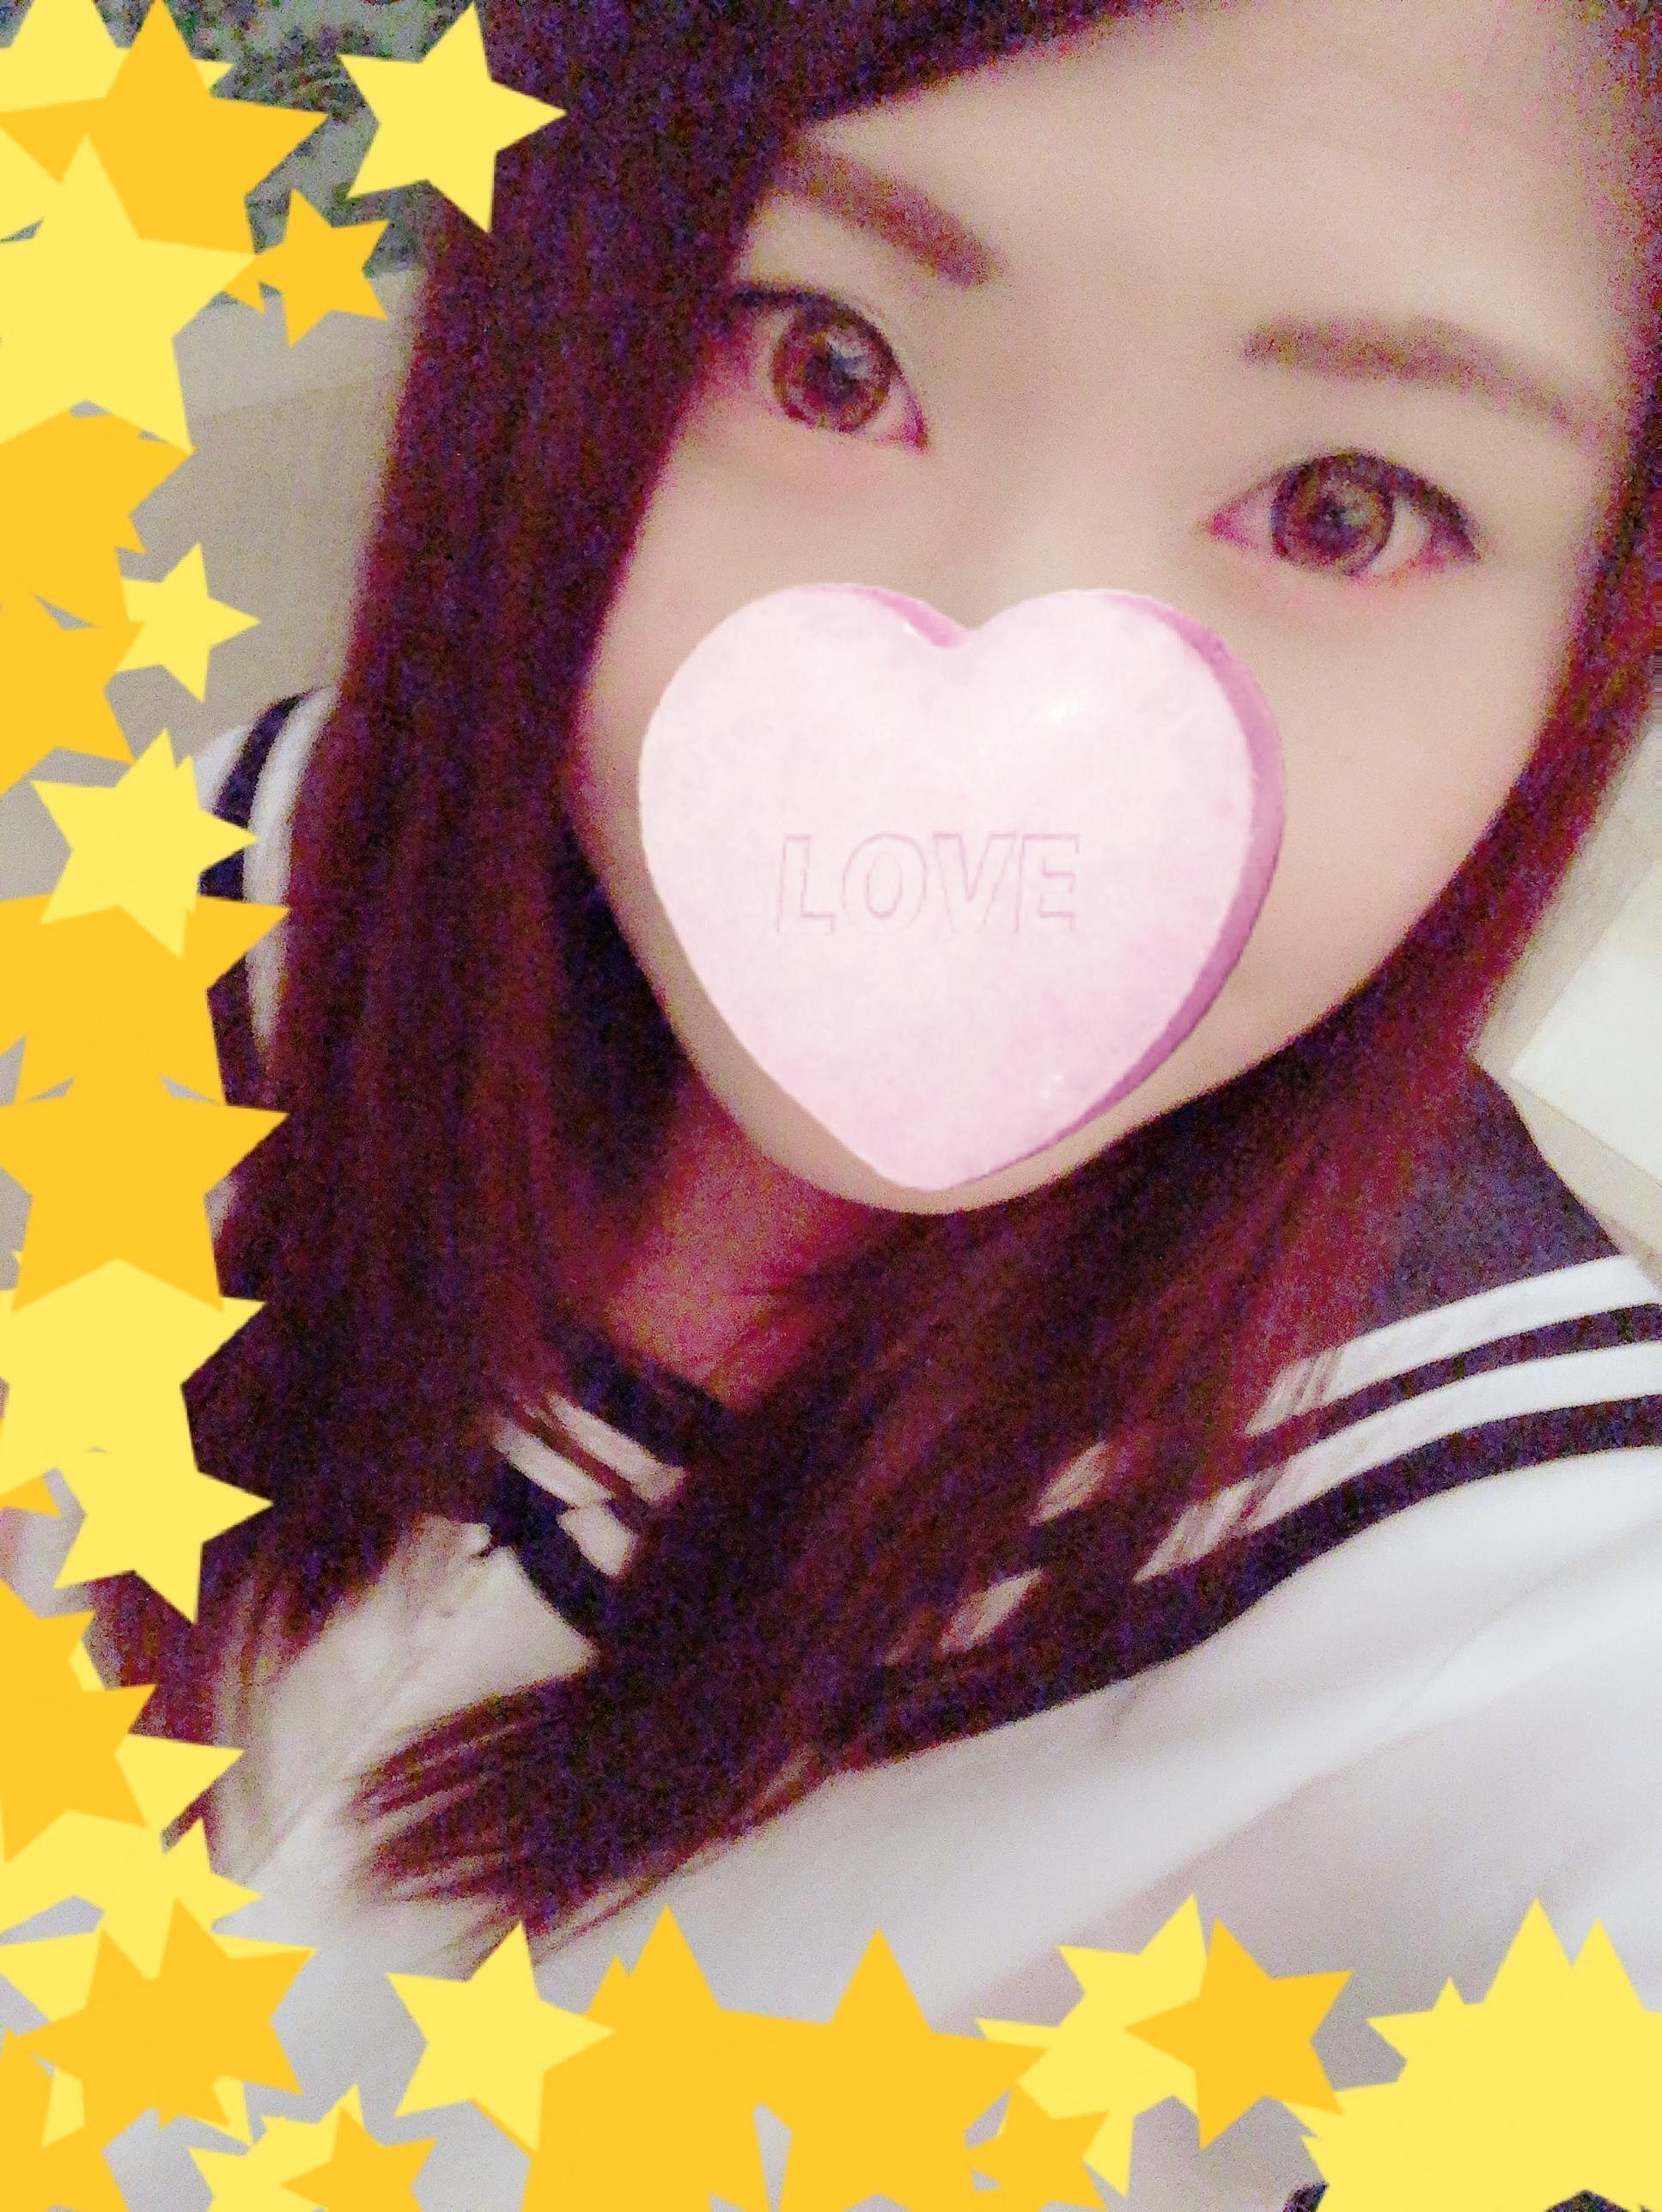 「November 5th ★」11/05(11/05) 17:53 | まどかの写メ・風俗動画